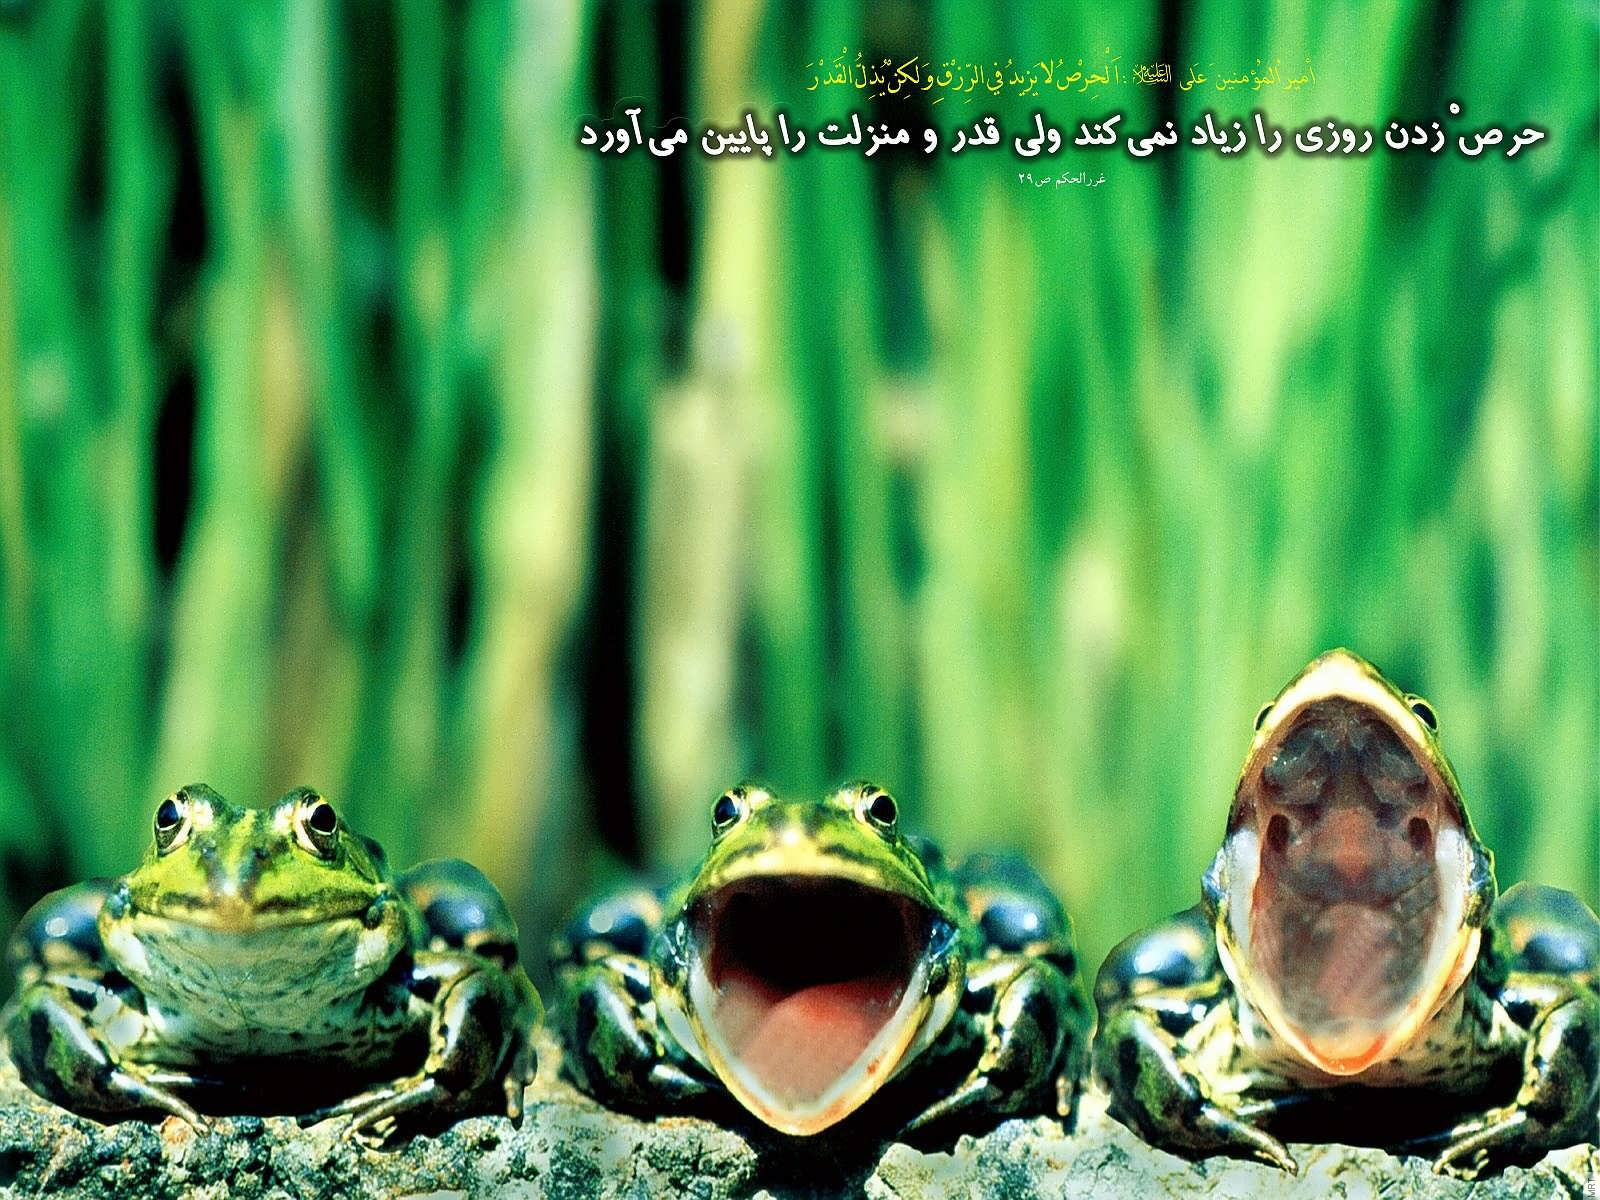 Hadis (126) Www.Nooriazbehesht.ir .jpg (1600×1200)